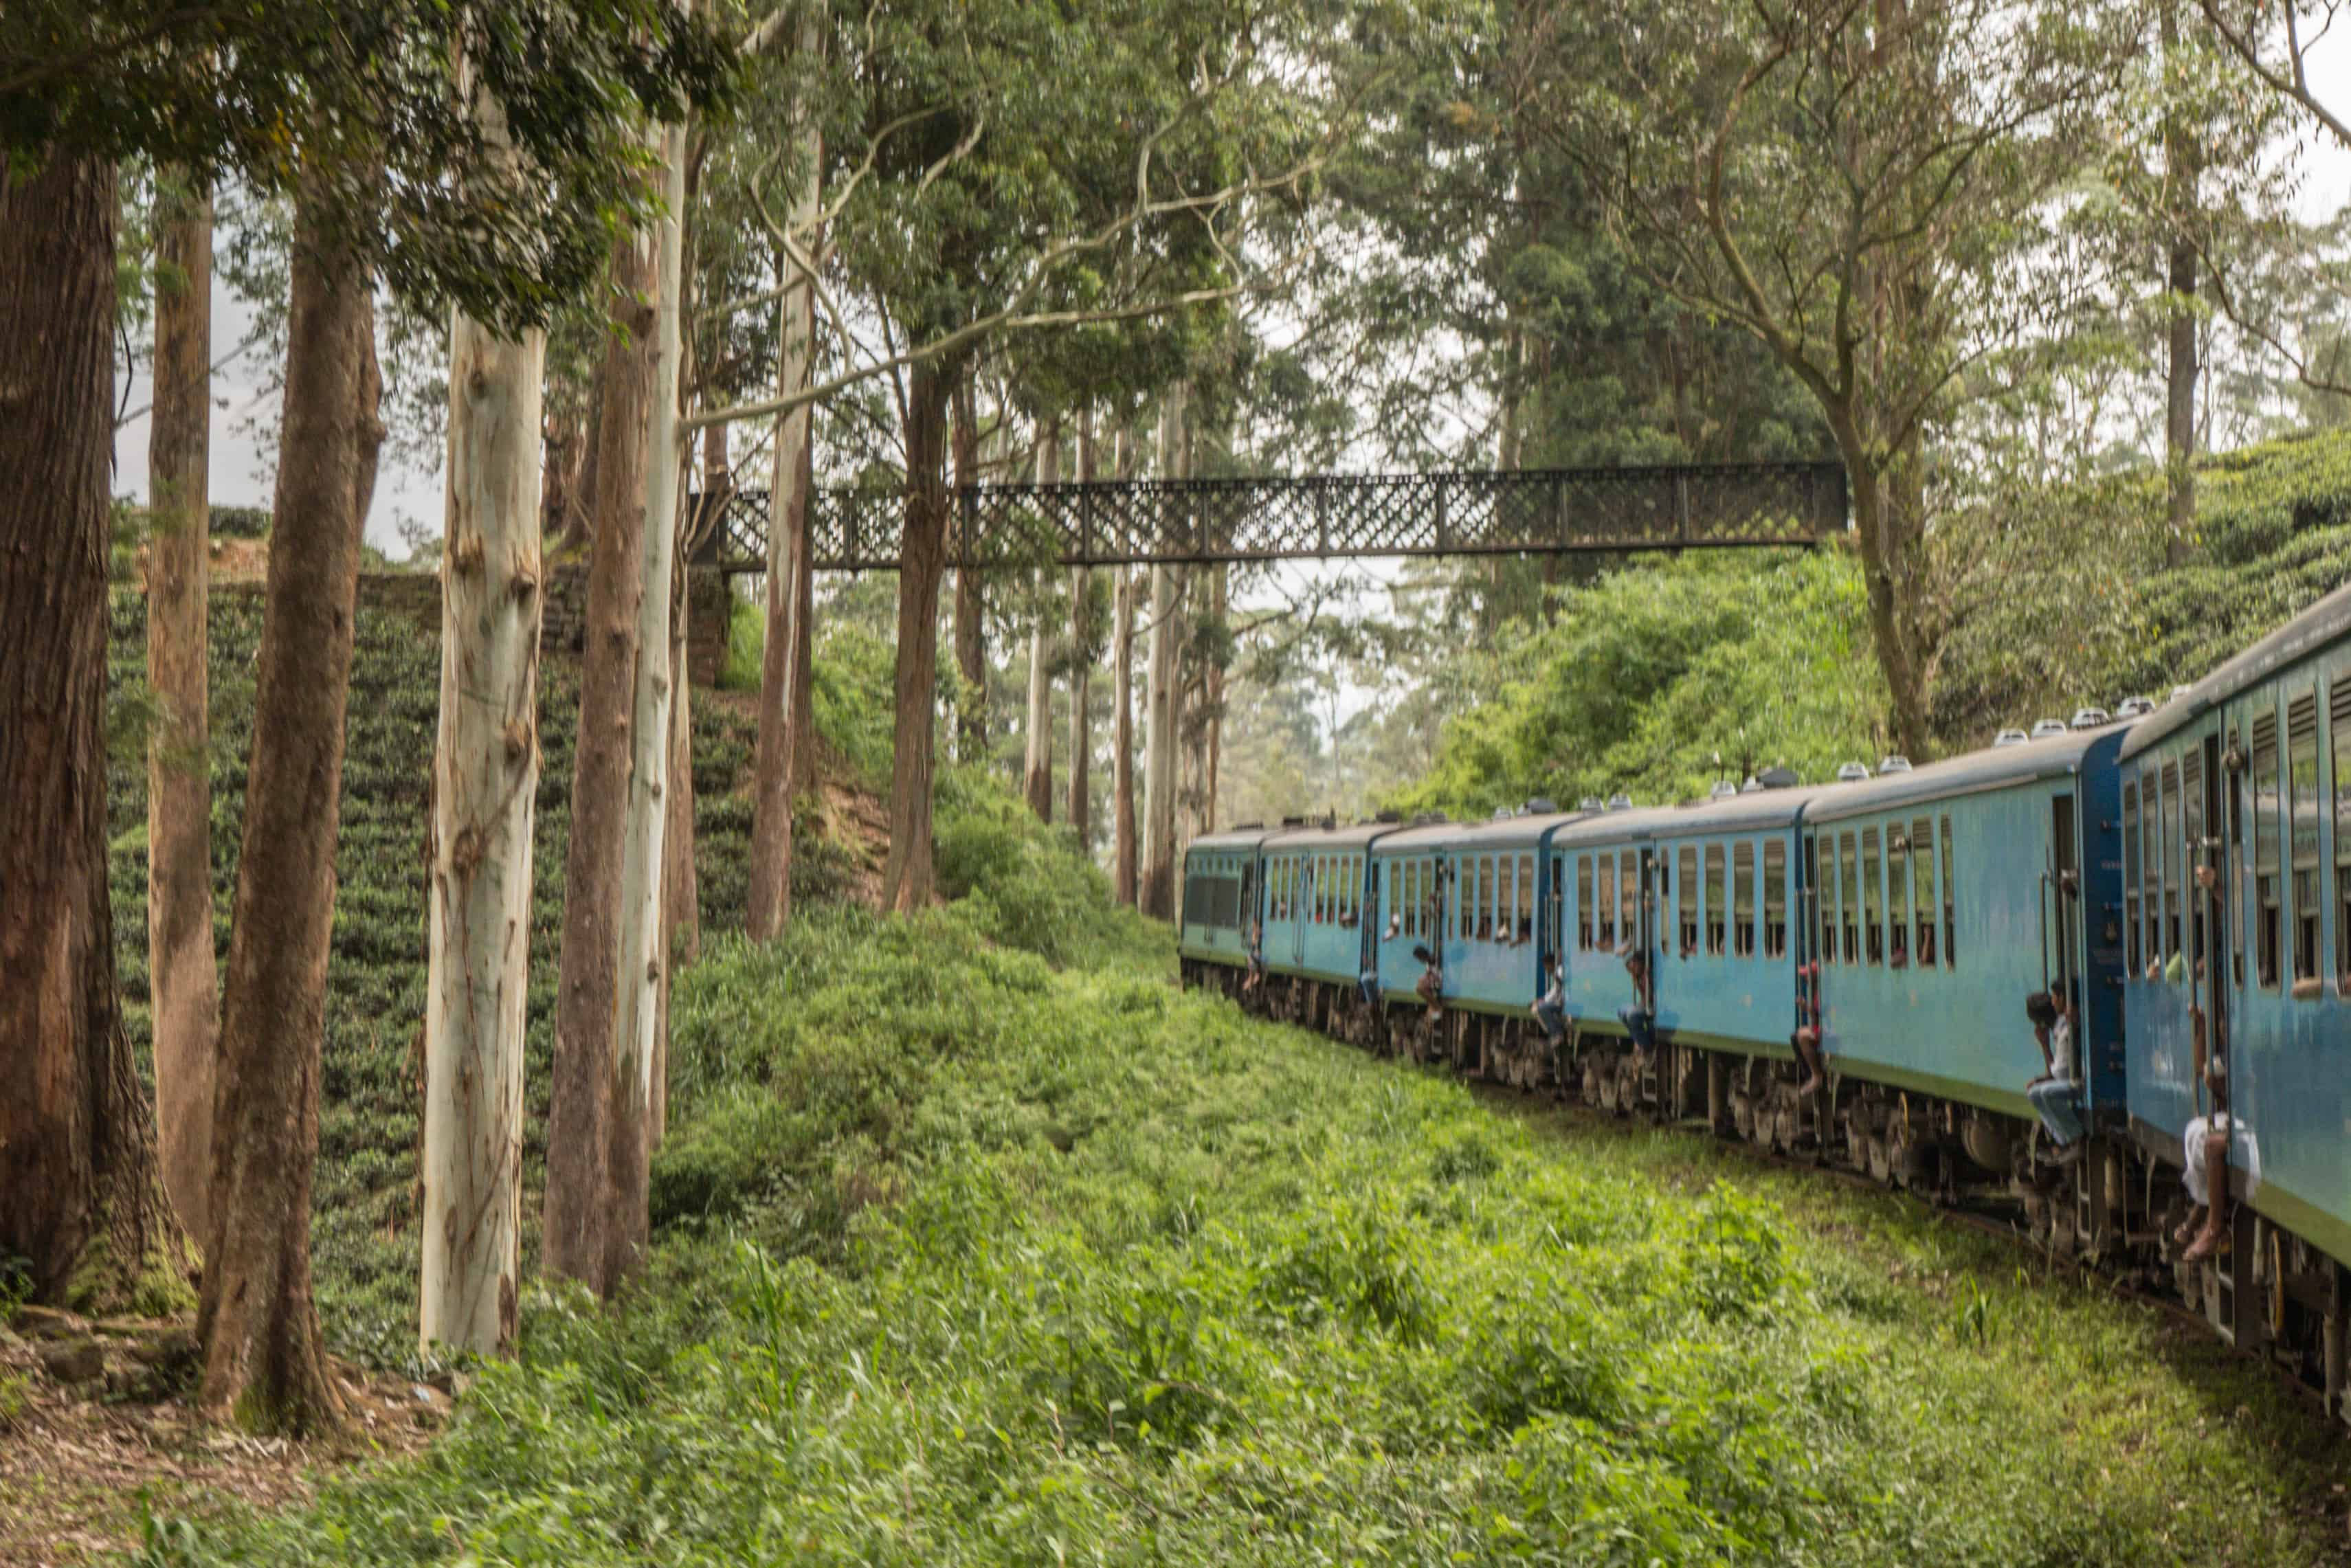 Sri Lanka; Kandy Ella train